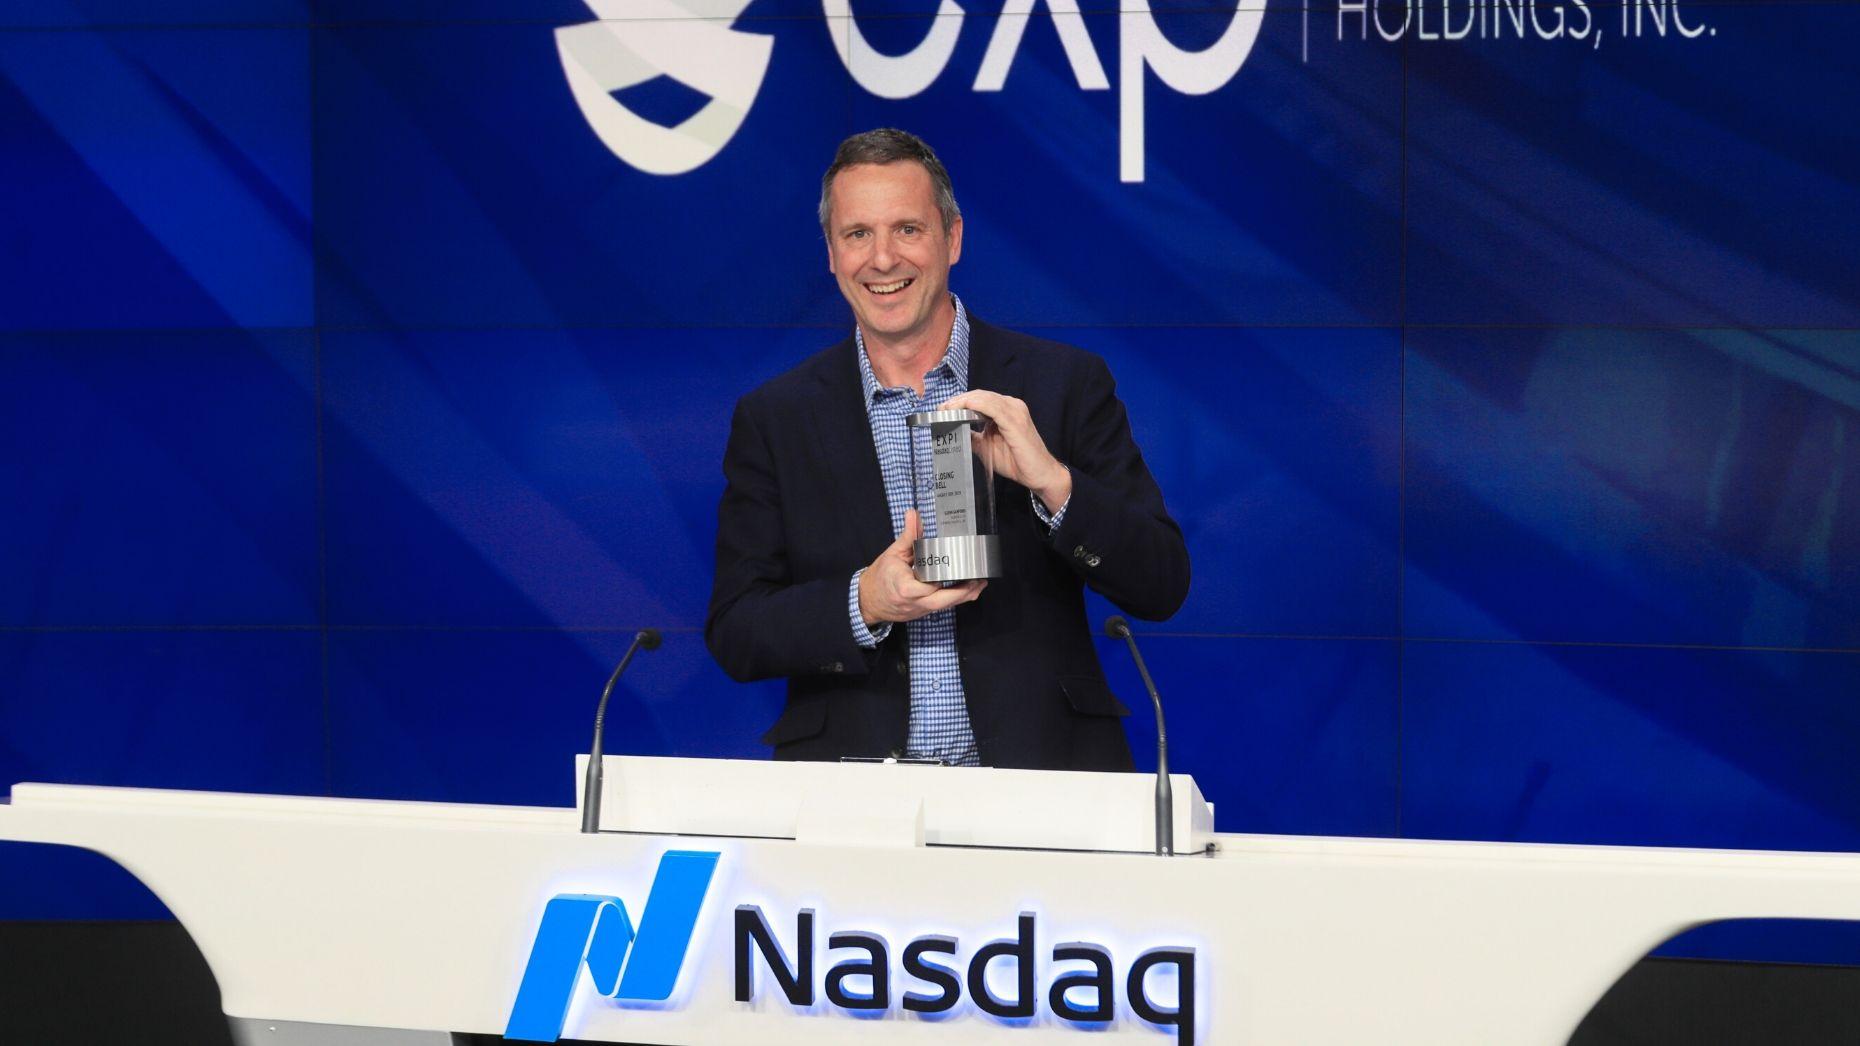 EXp dives into media business with acquisition of SUCCESS Enterprises